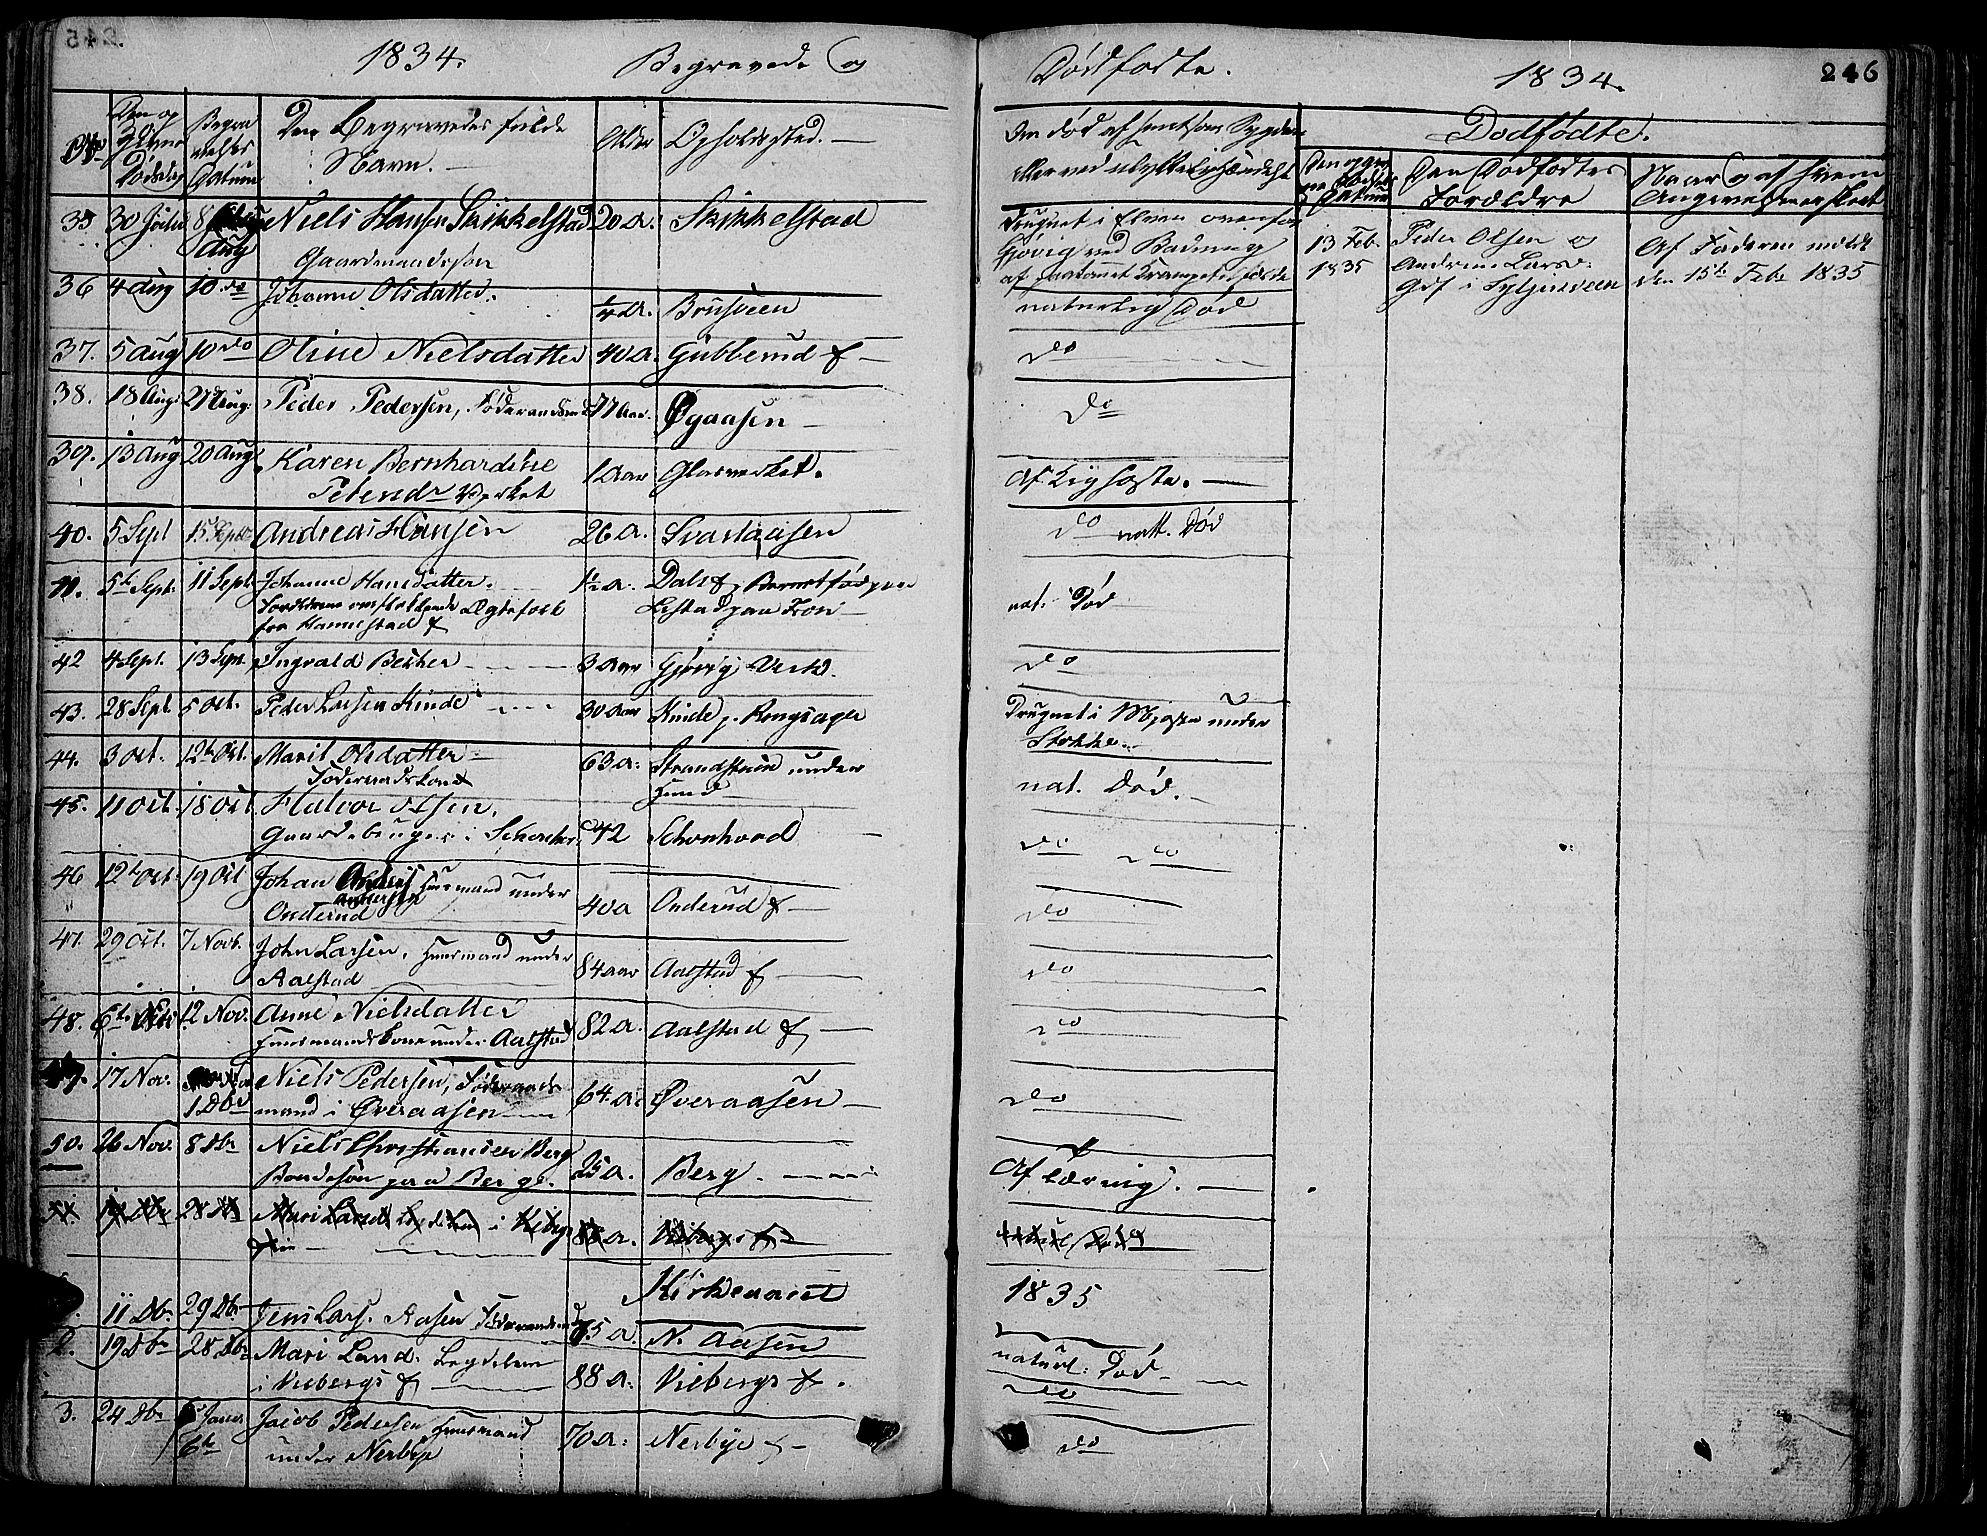 SAH, Vardal prestekontor, H/Ha/Hab/L0004: Klokkerbok nr. 4, 1831-1853, s. 246